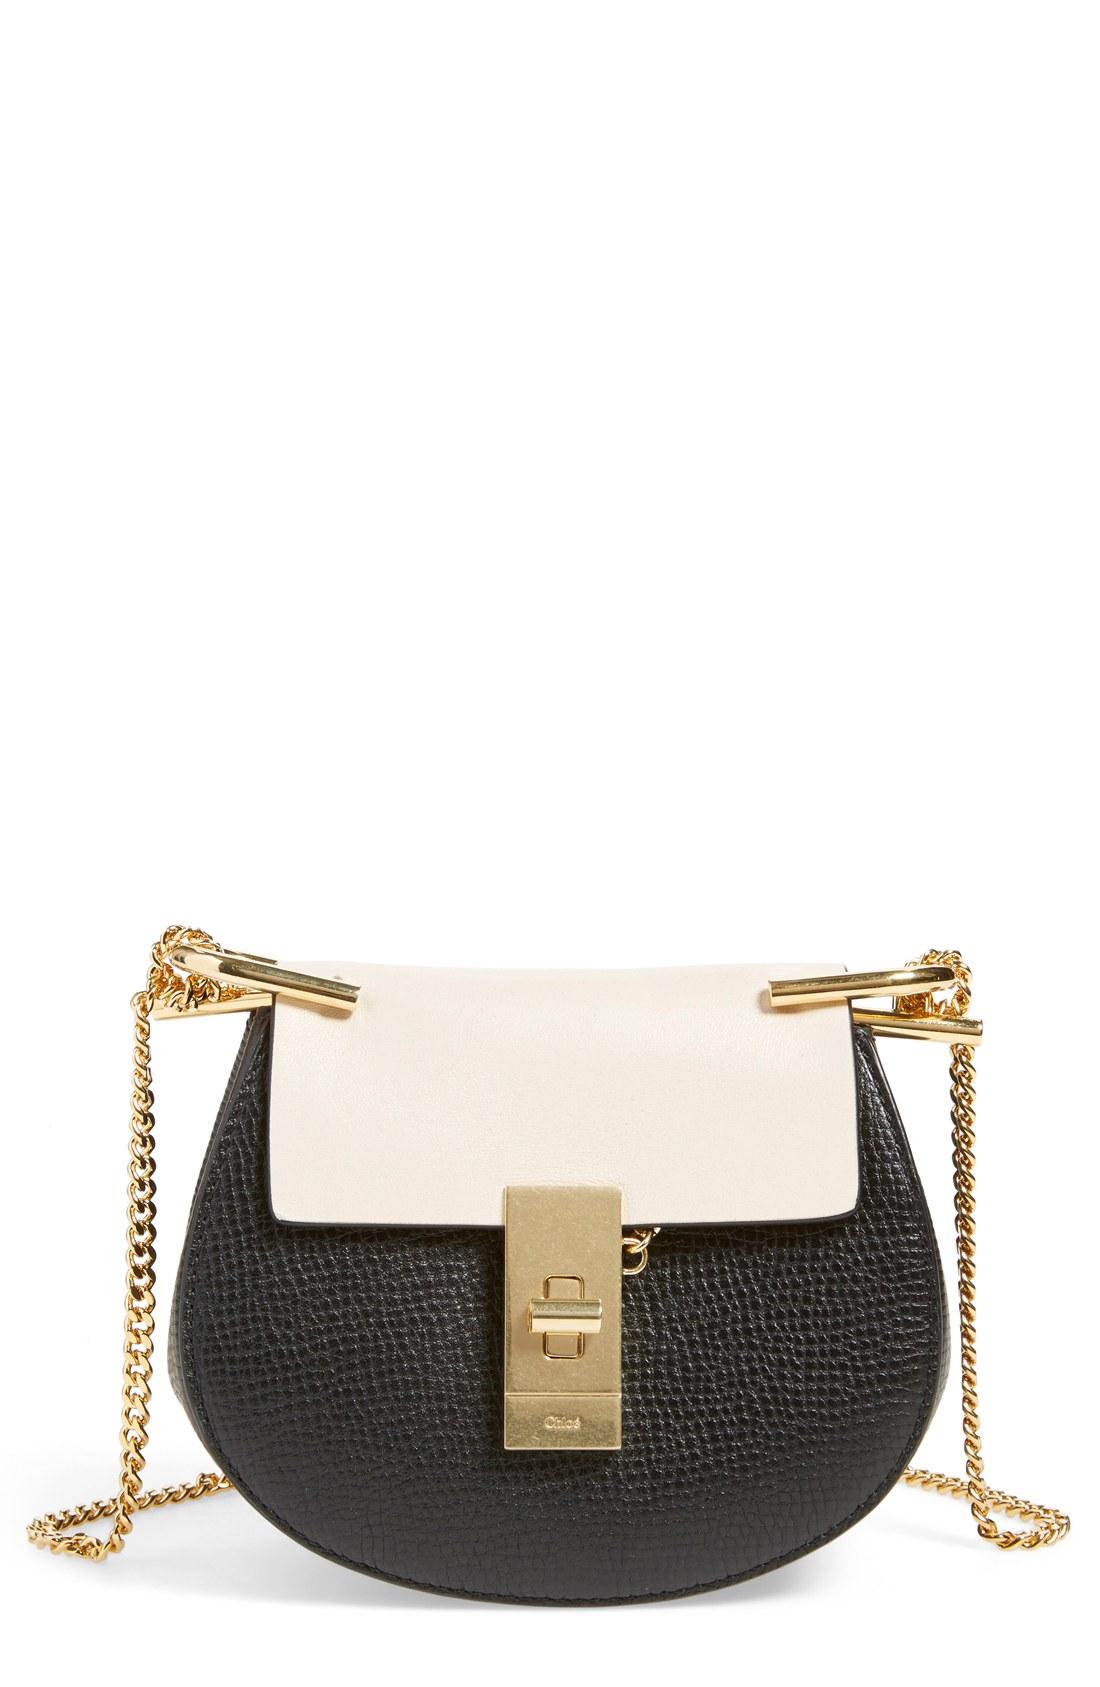 chloe white leather handbag - dkc2h8-i.jpg